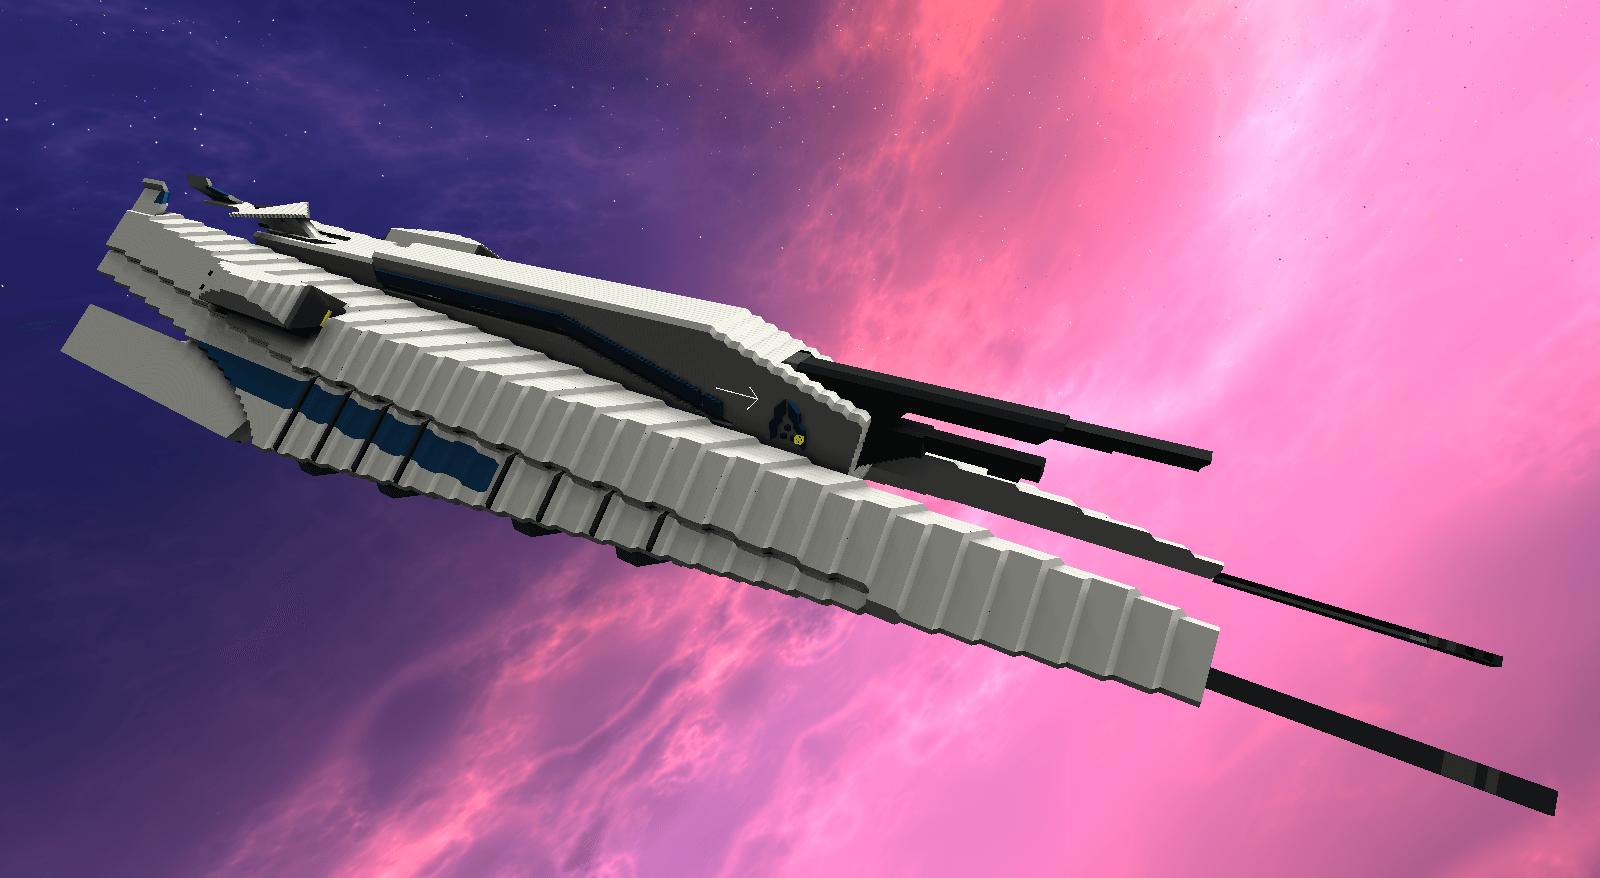 starmade-screenshot-0068.png